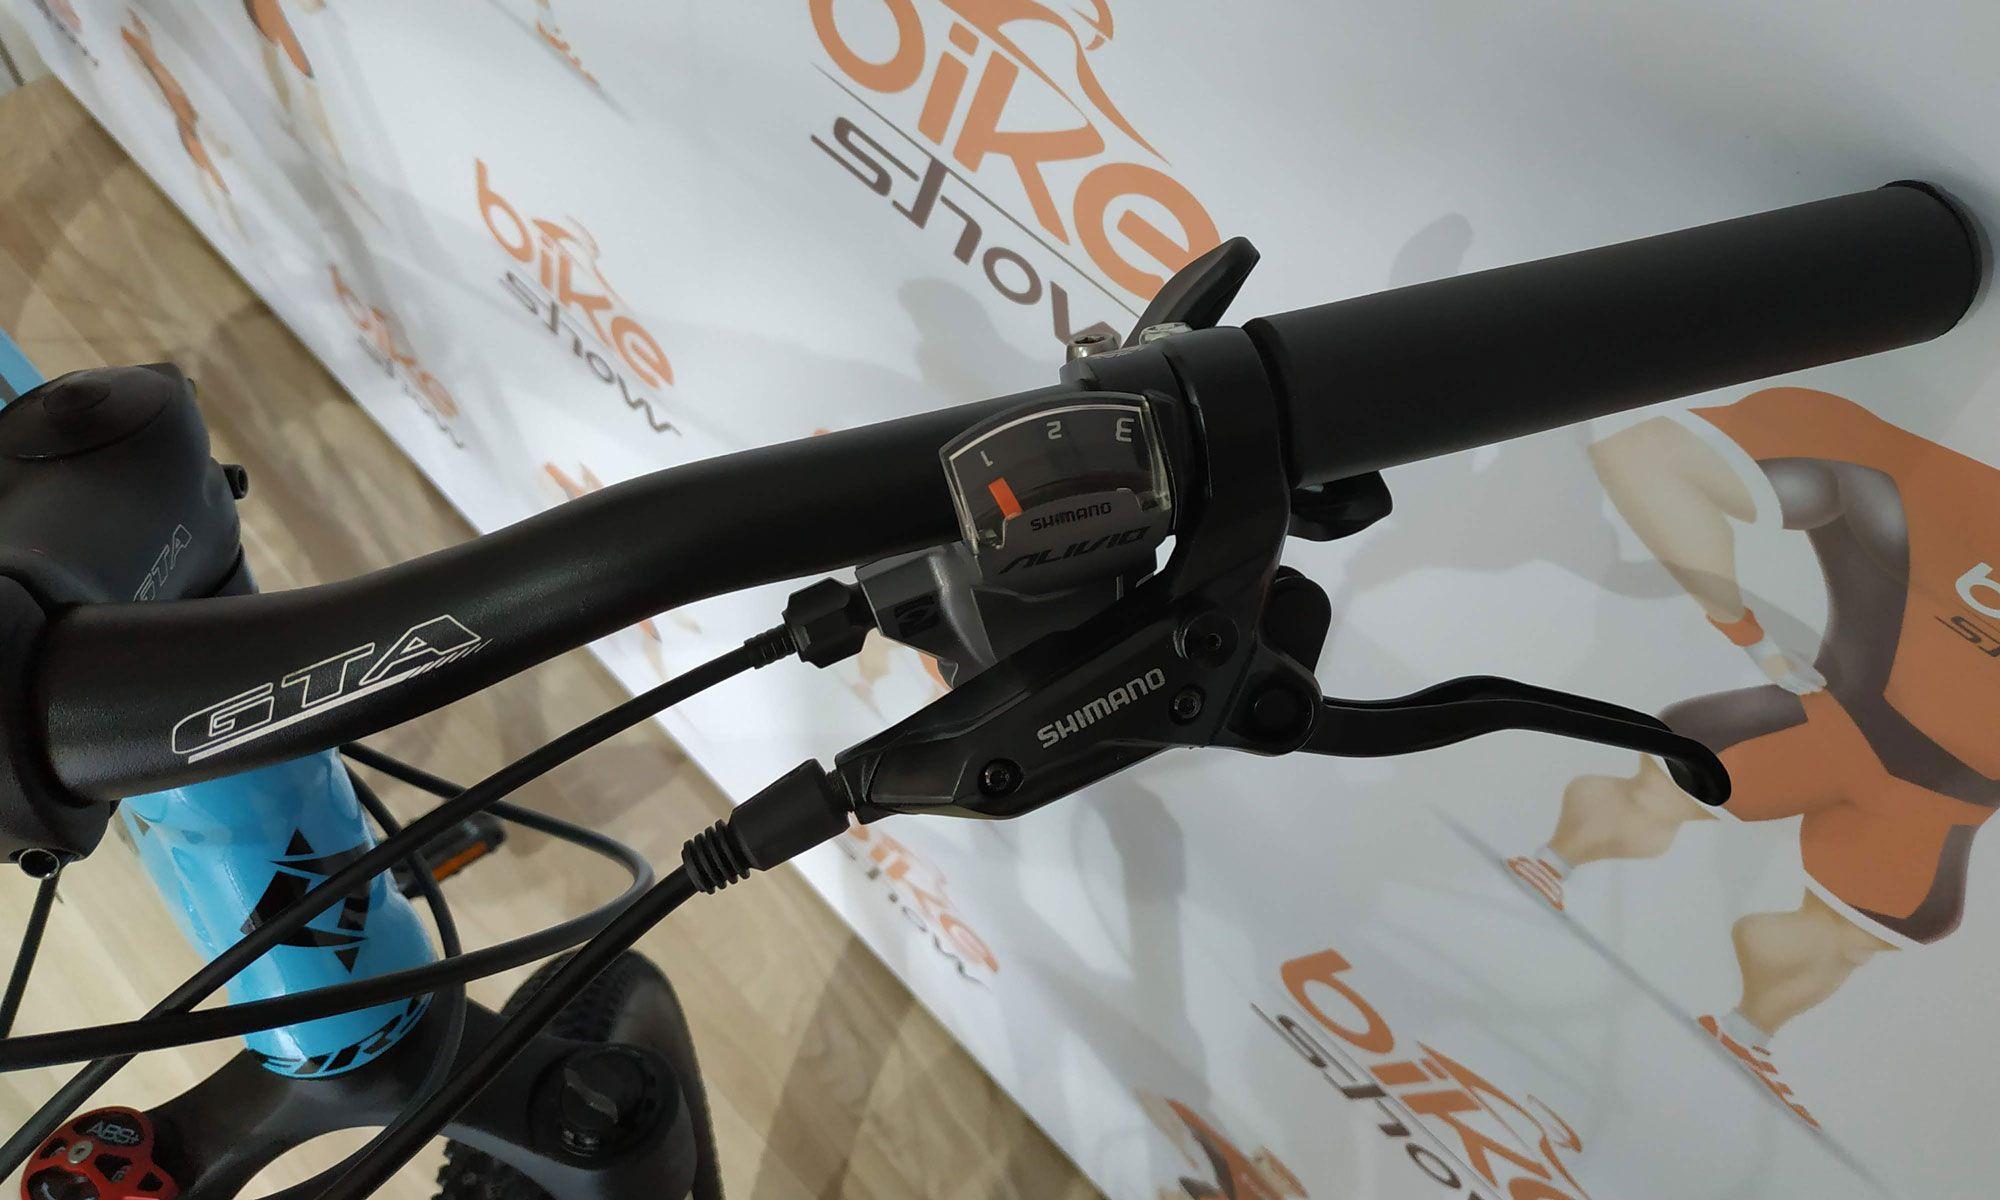 Bicicleta FIRST Lifty aro 29 - 27v Shimano Alívio - Freio Shimano Hidráulico - Suspensão GTA toda em alumínio trava ombro